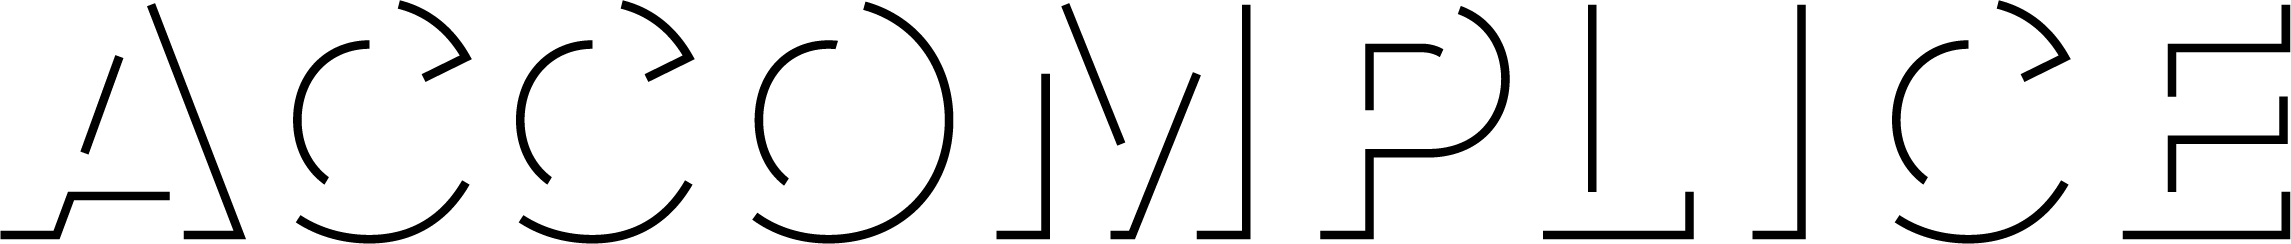 Accomplice logo